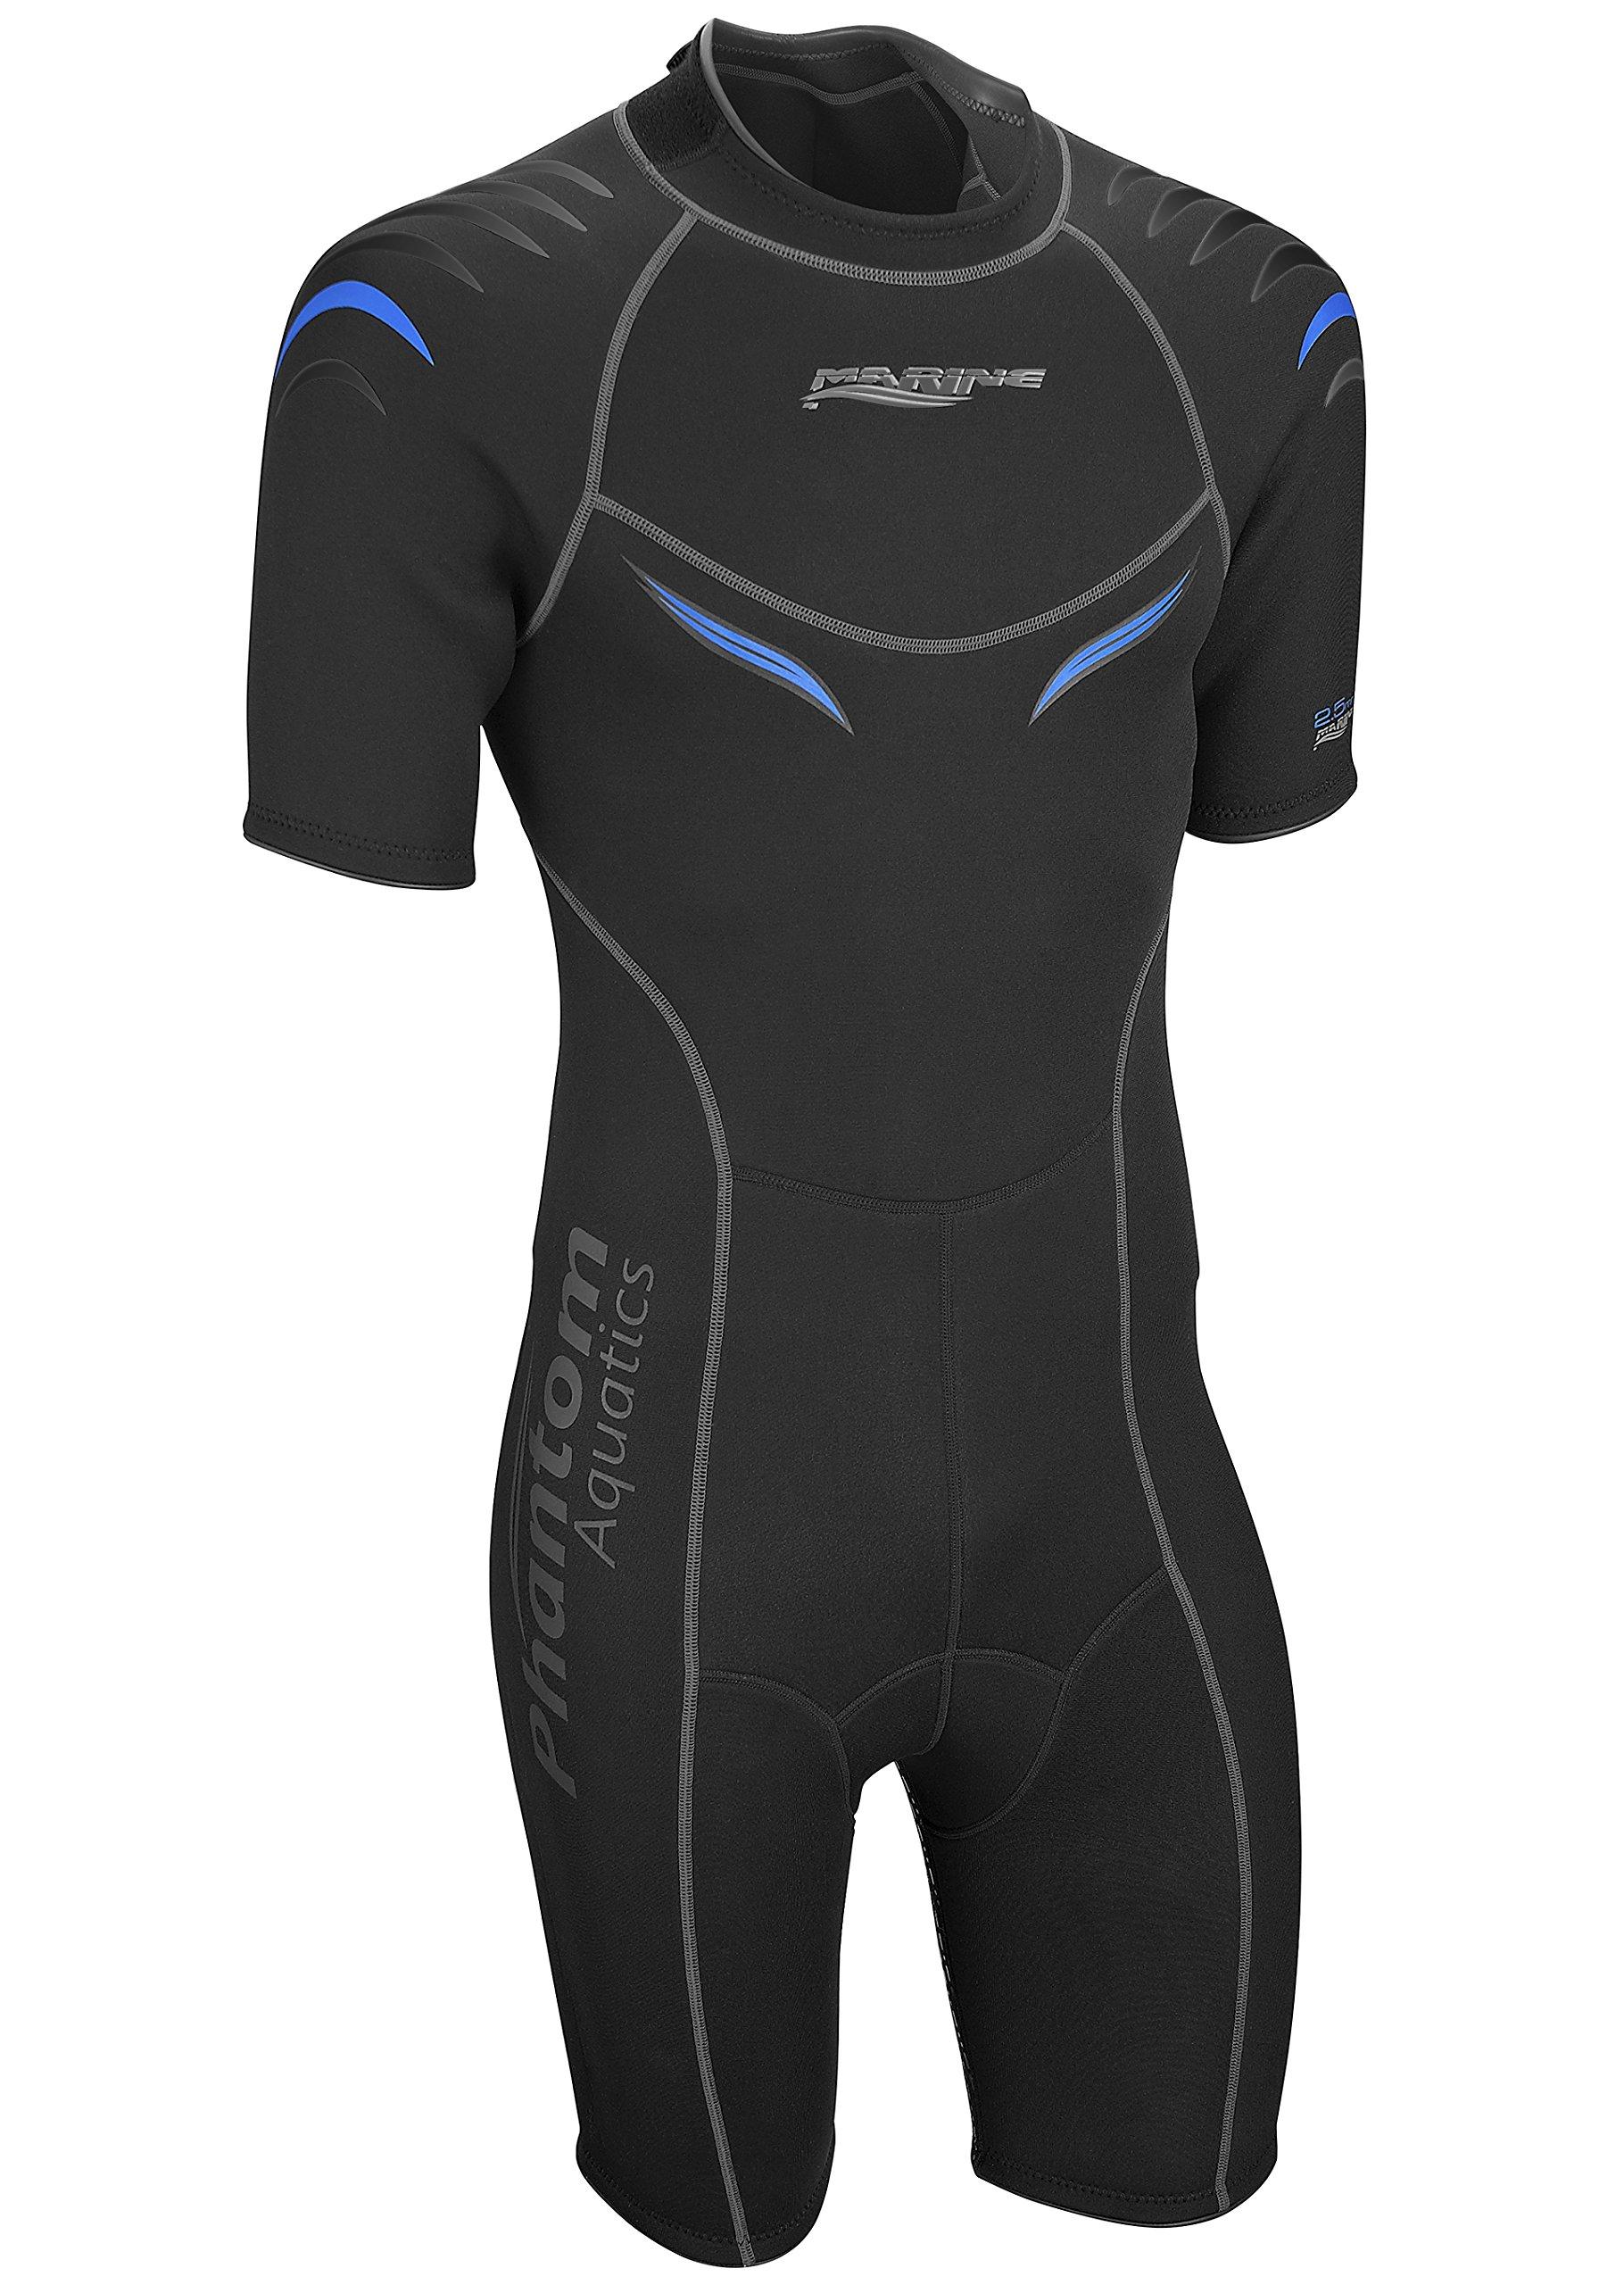 Phantom Aquatics Marine Men's Shorty Wetsuit, Black Blue - XXX-Large by Phantom Aquatics